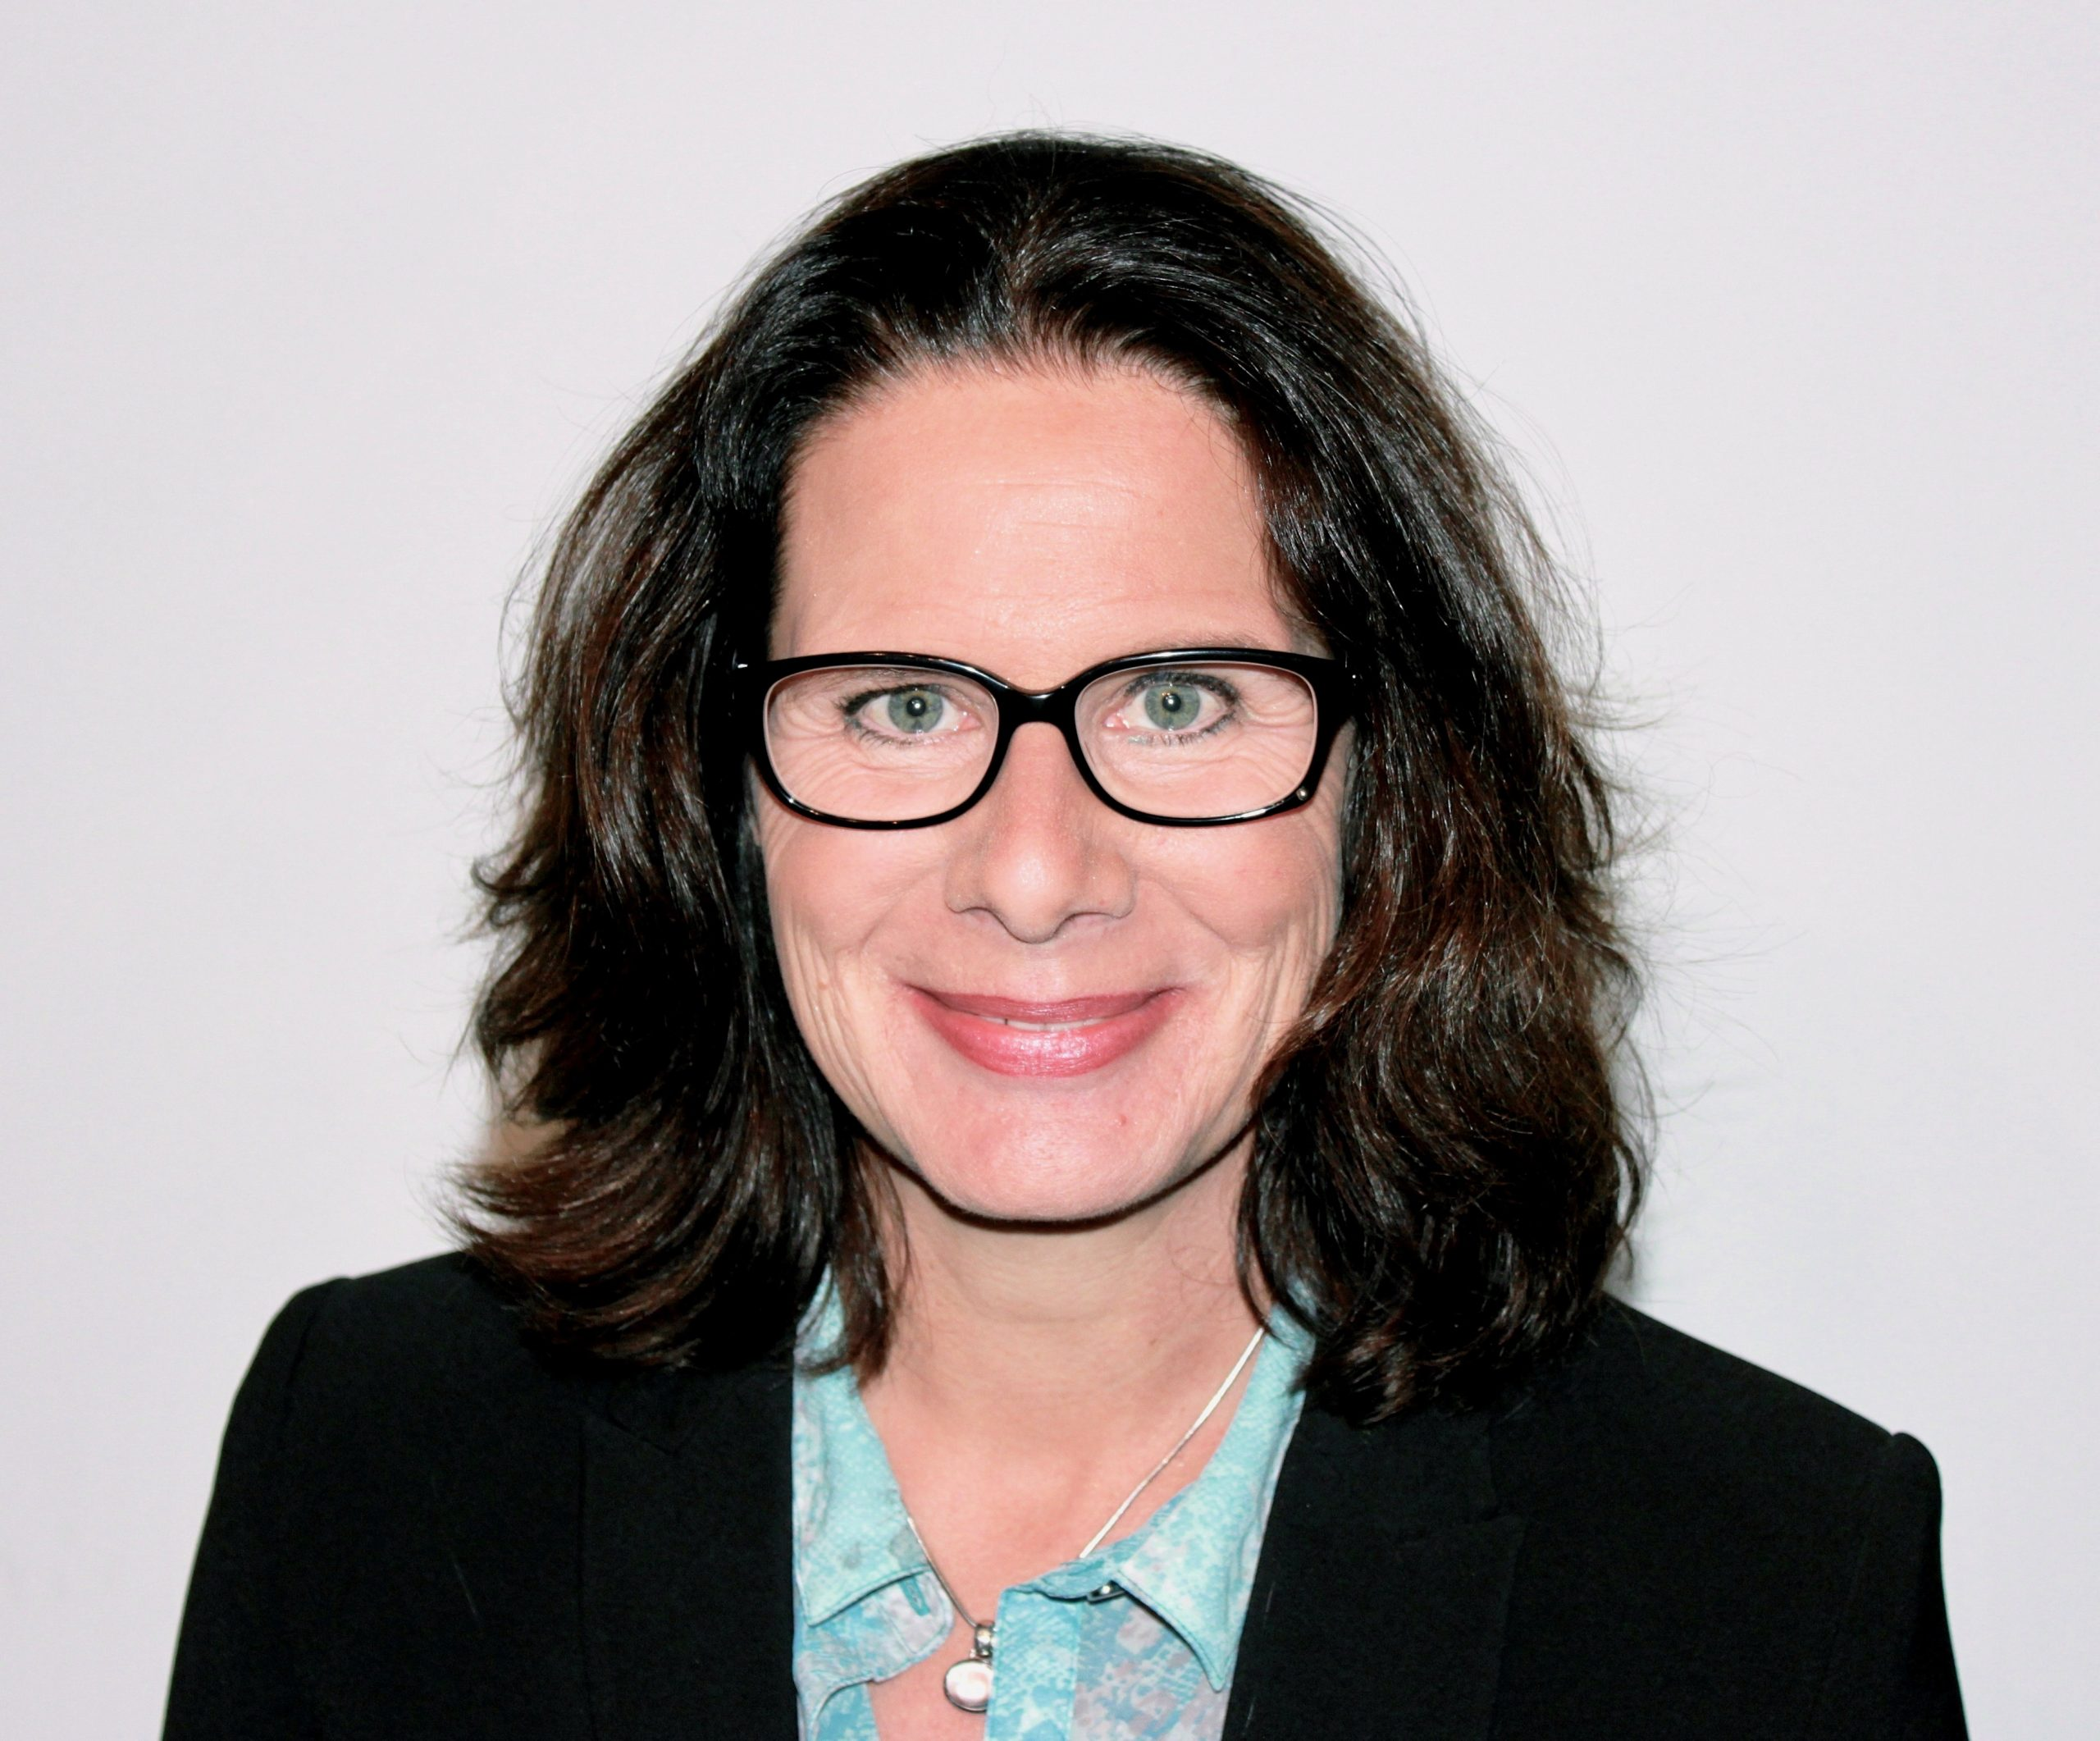 Valerie Schlegel